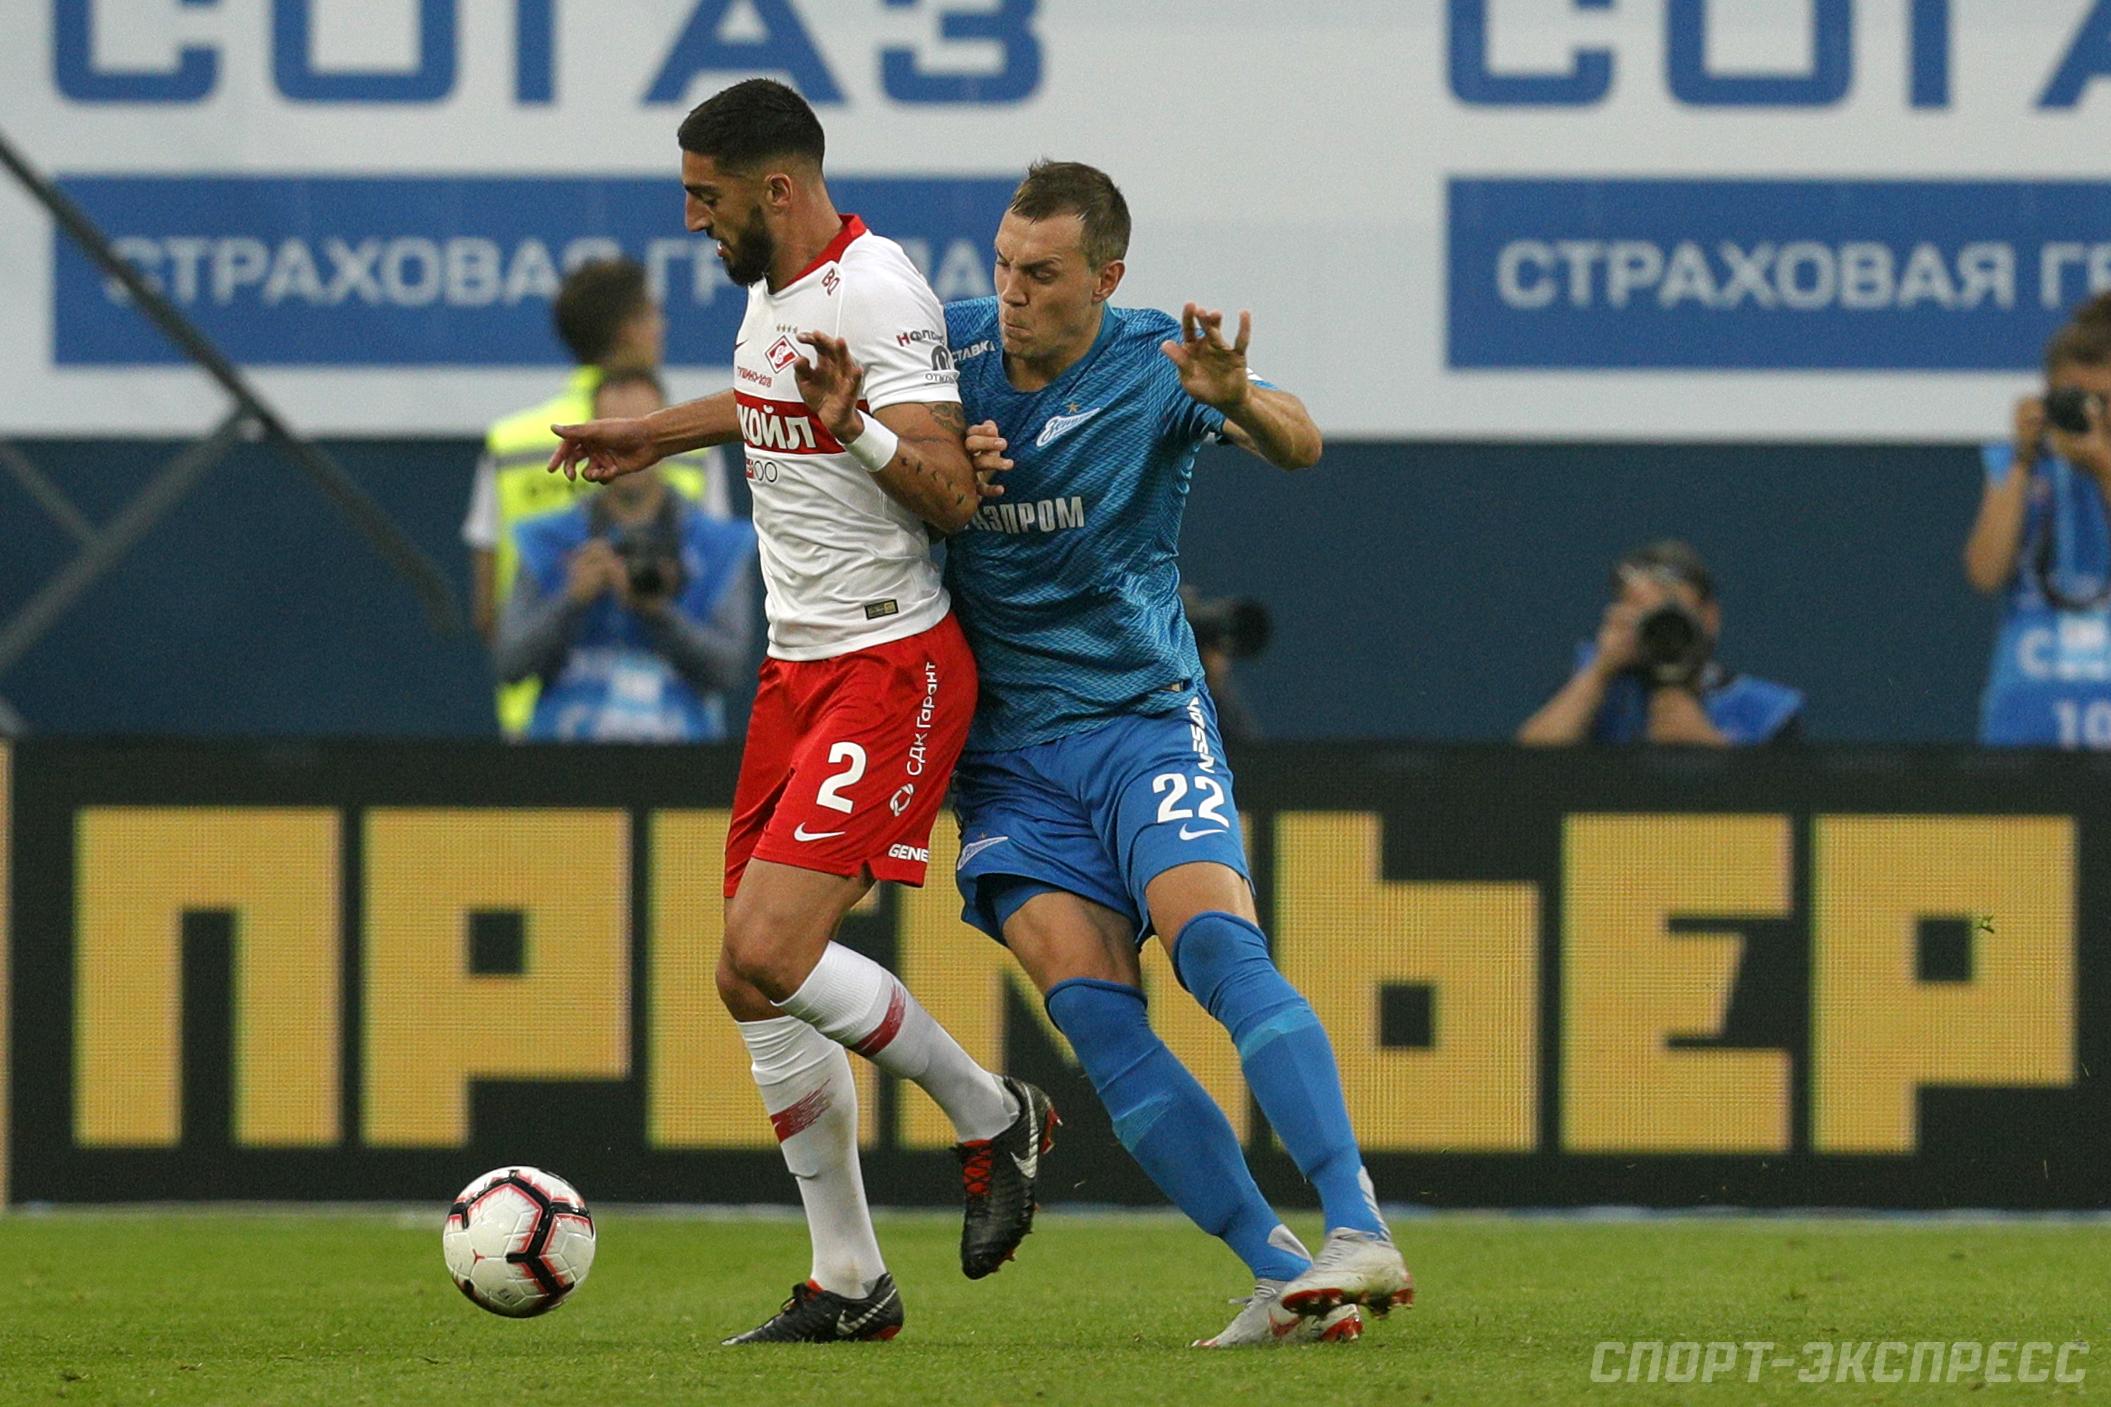 Прогноз на матч Урал - Зенит Санкт-Петербург 09 августа 2017